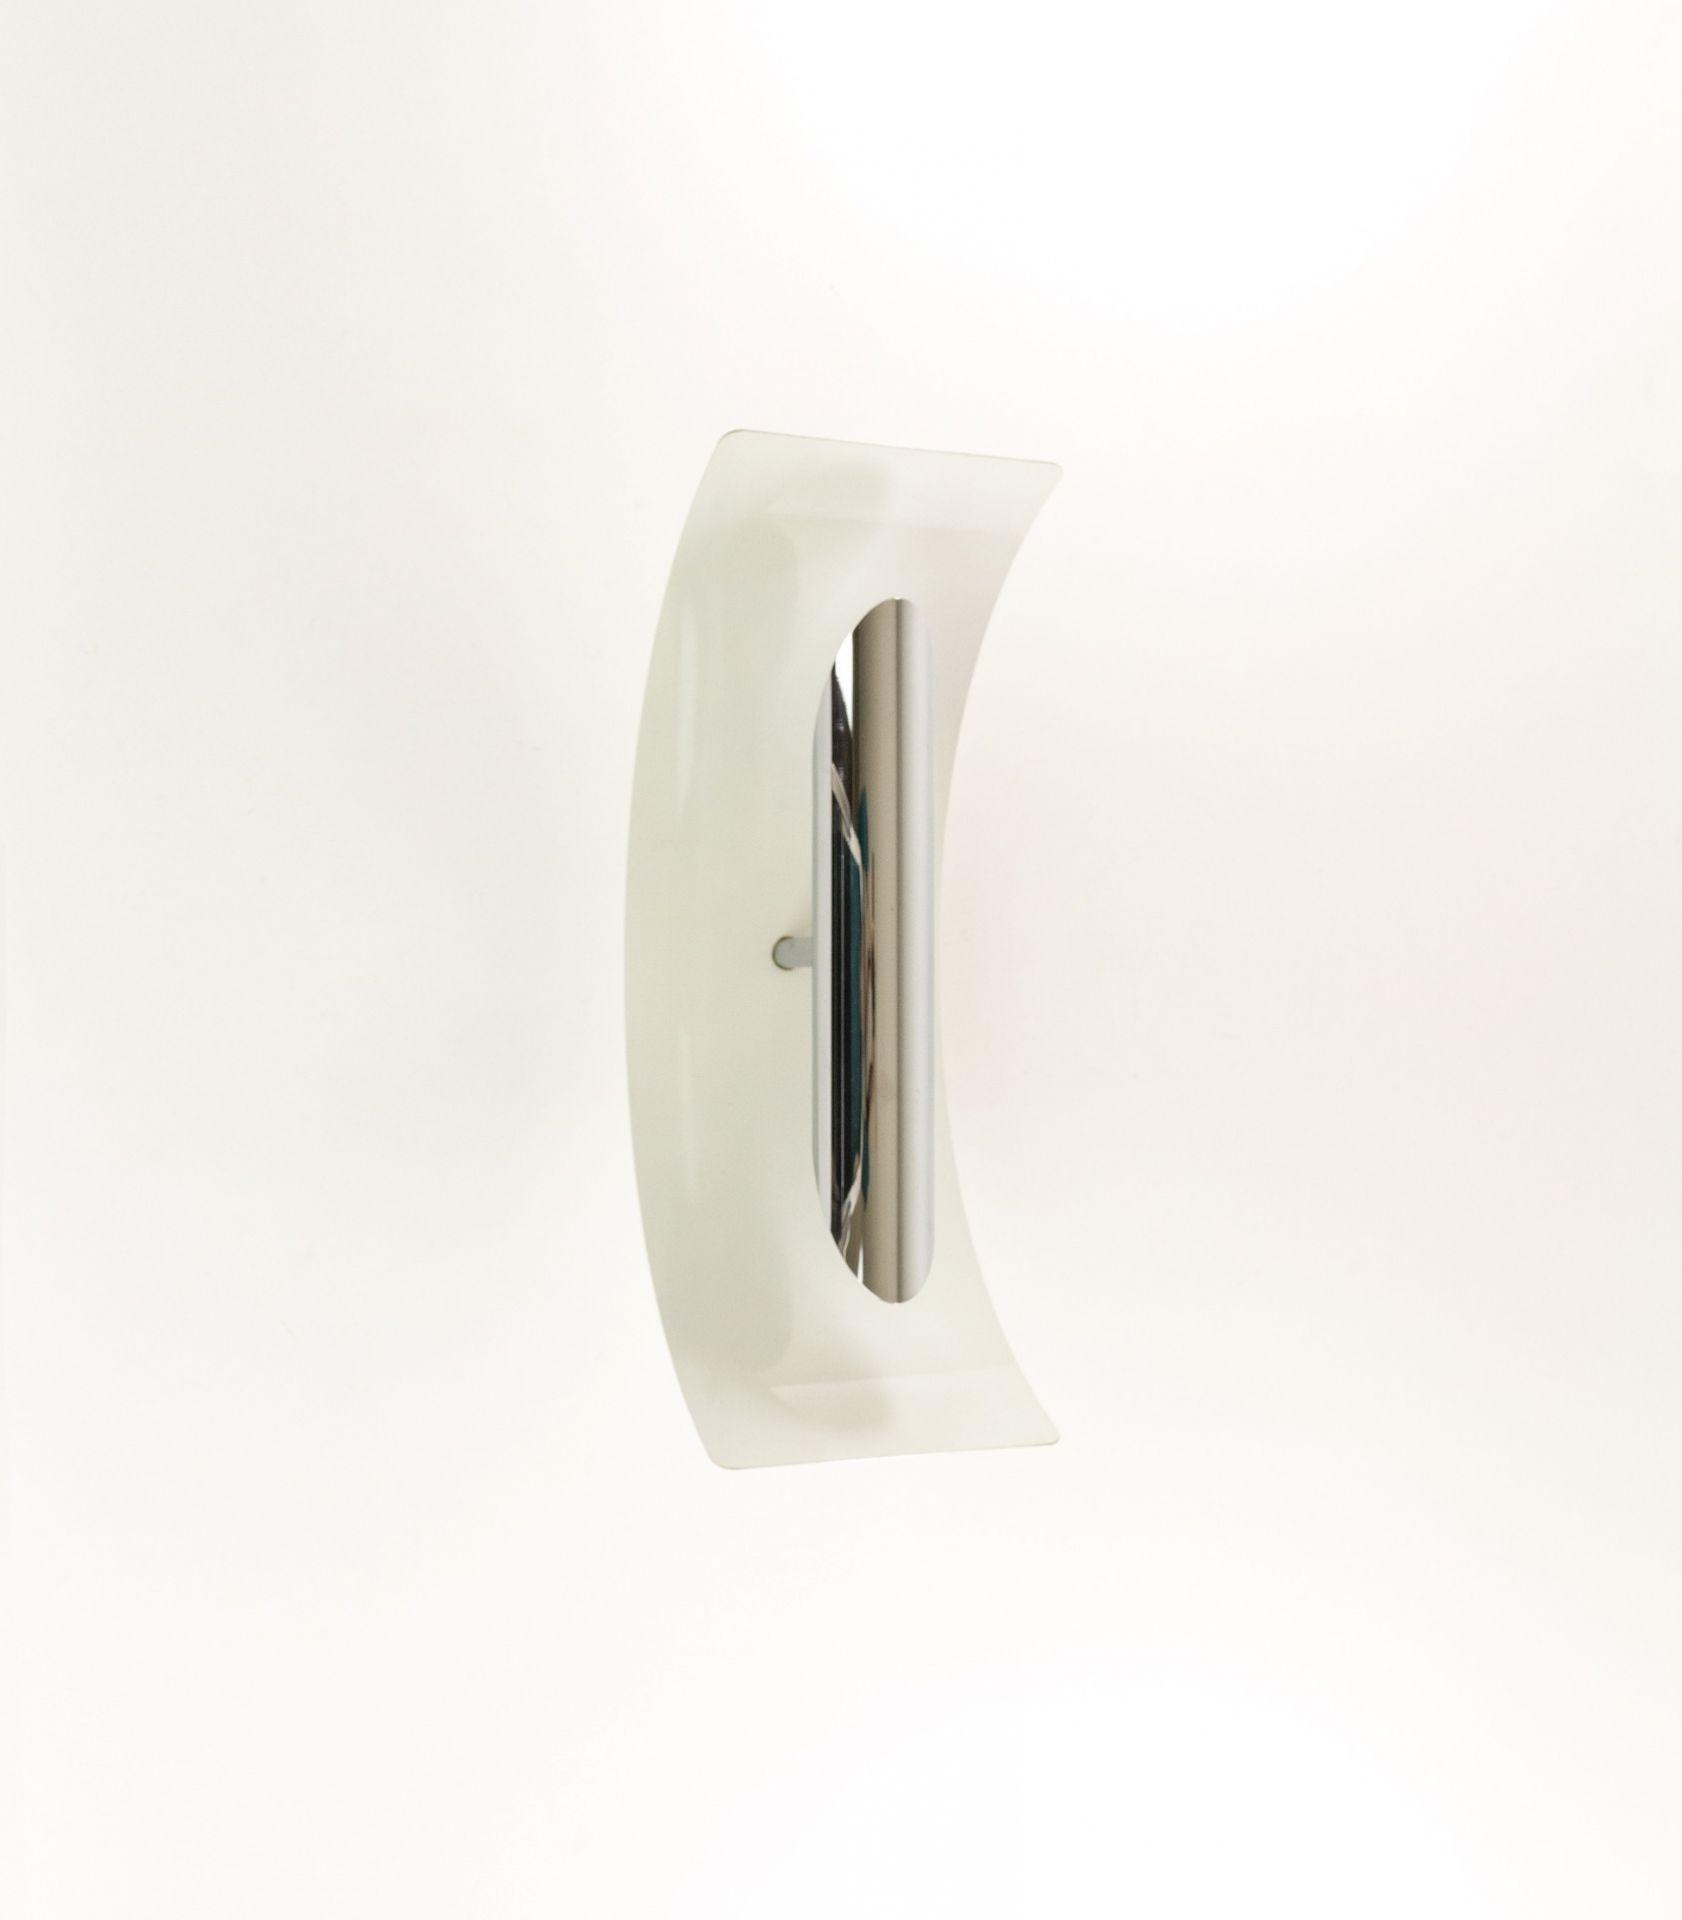 Chromed metal wall Lamp by Goffredo Reggiani for Reggiani, 1970s